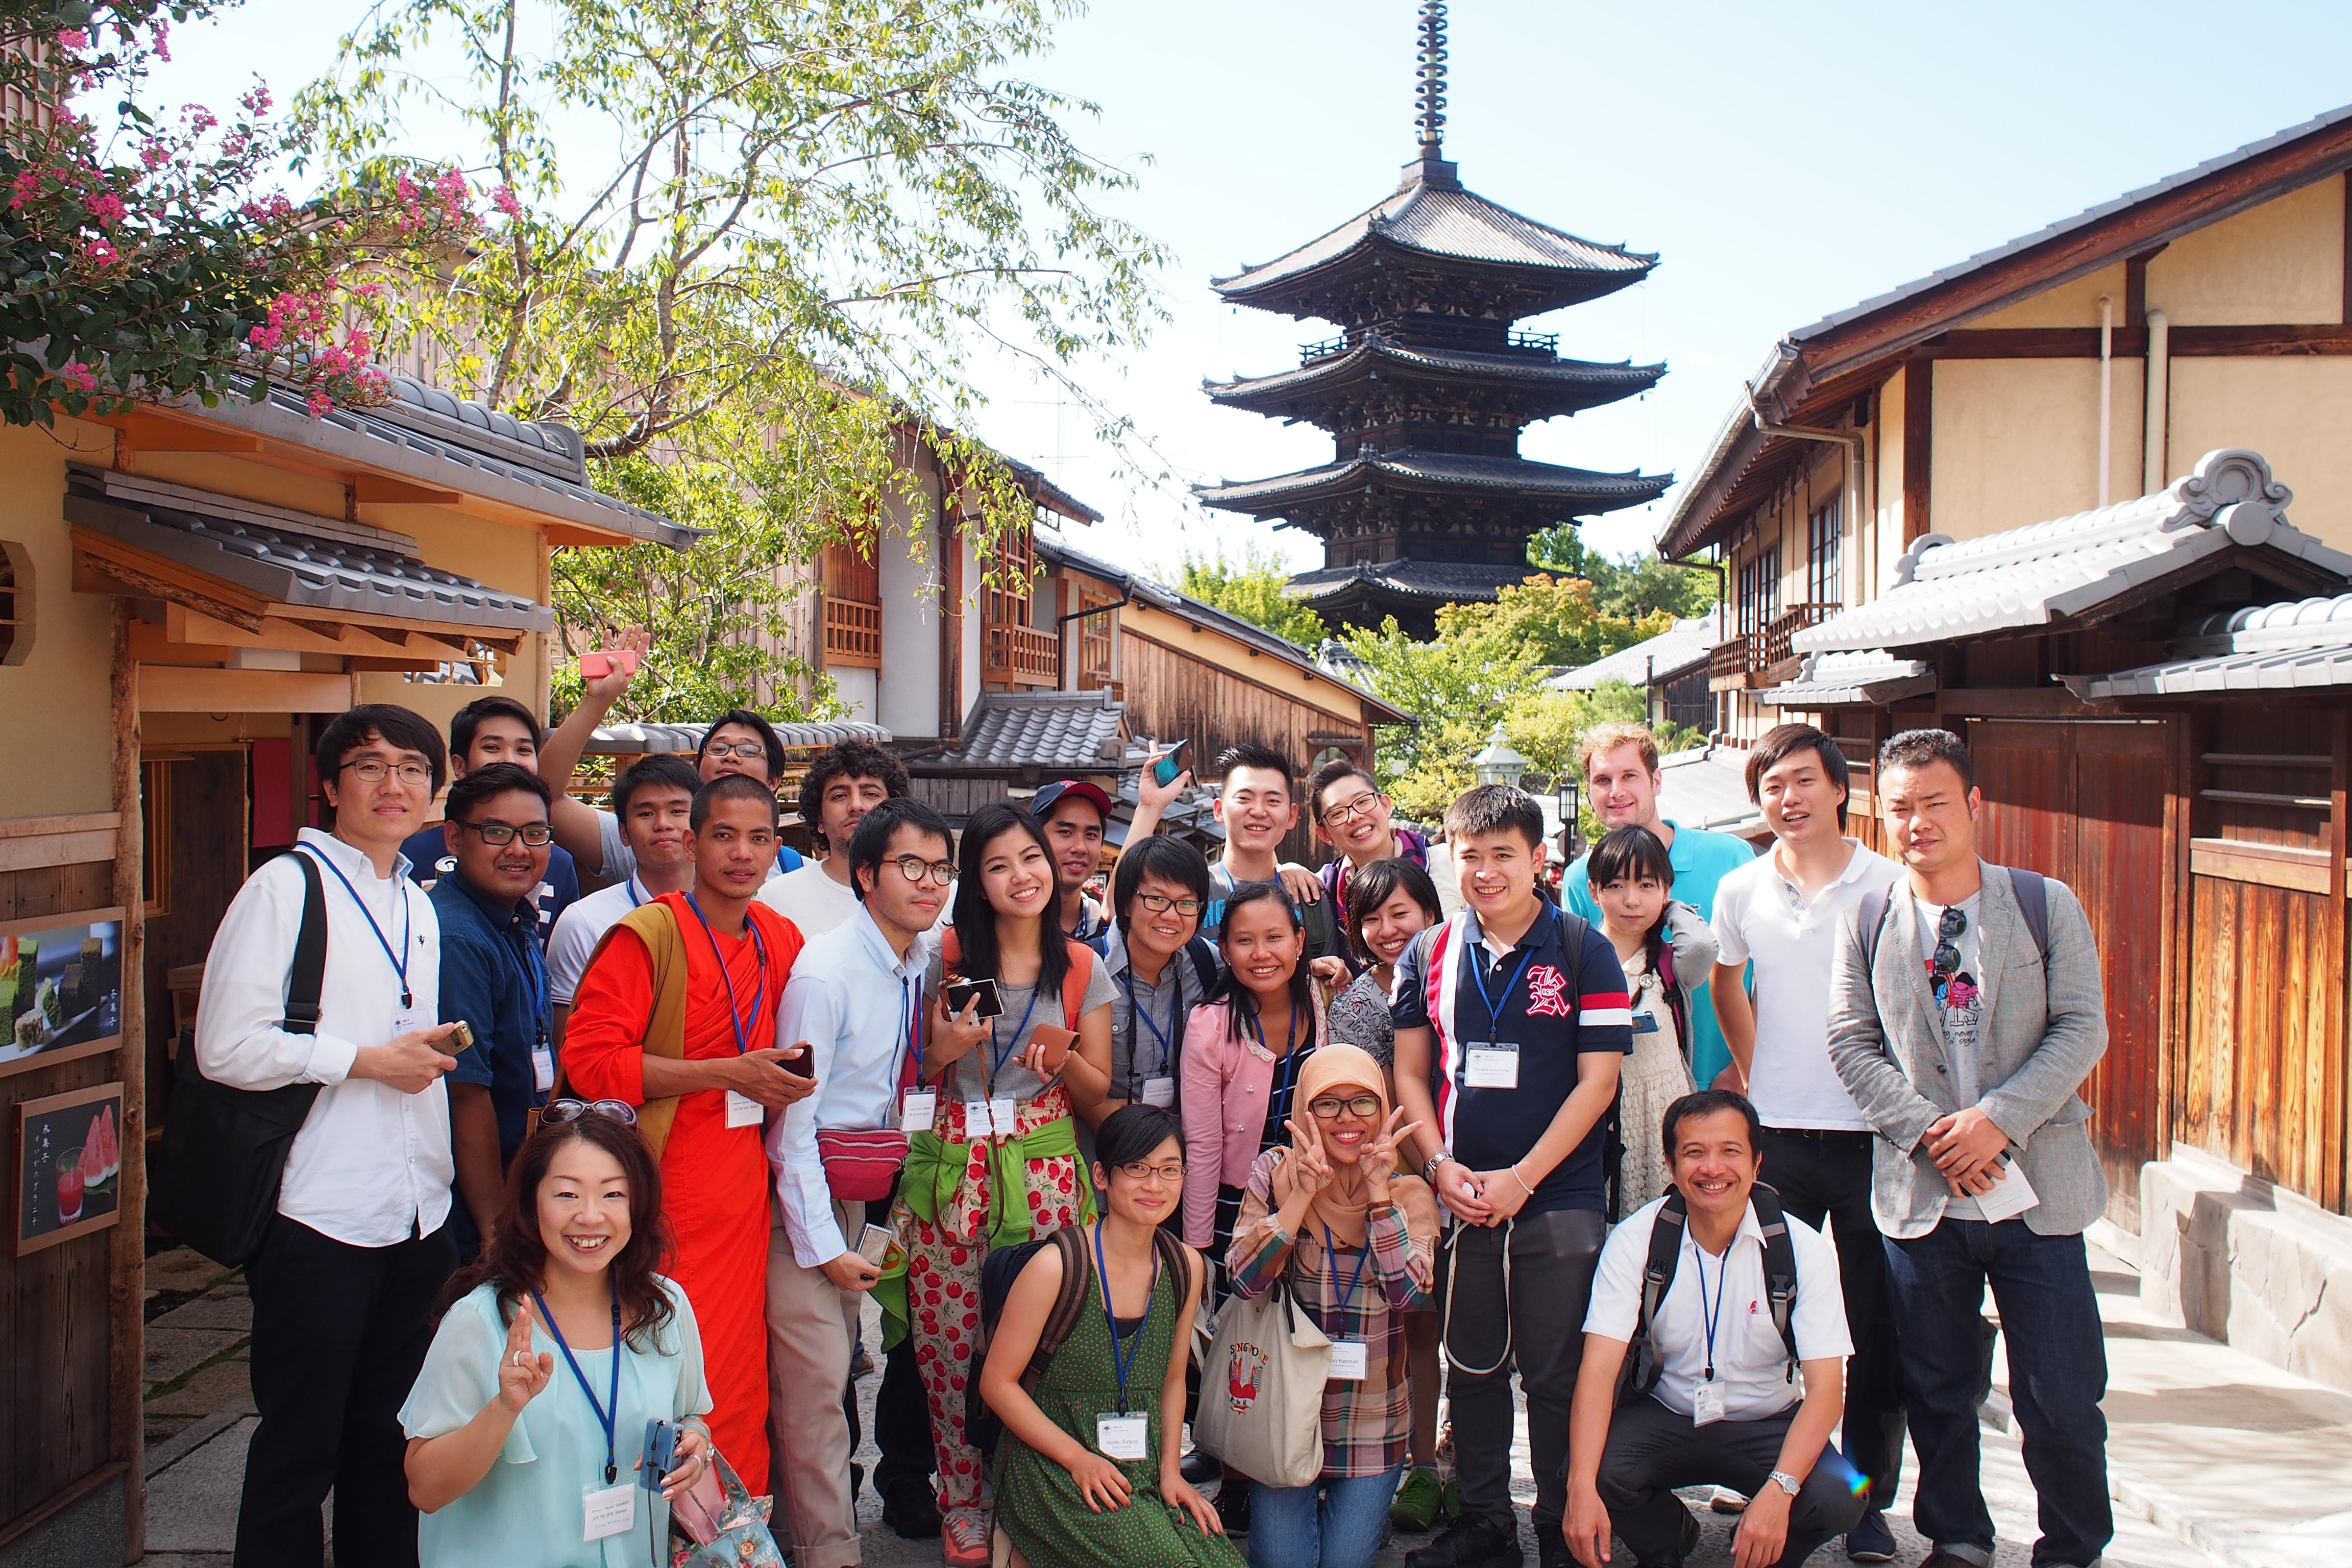 Participants visiting the Kiyomizu Temple